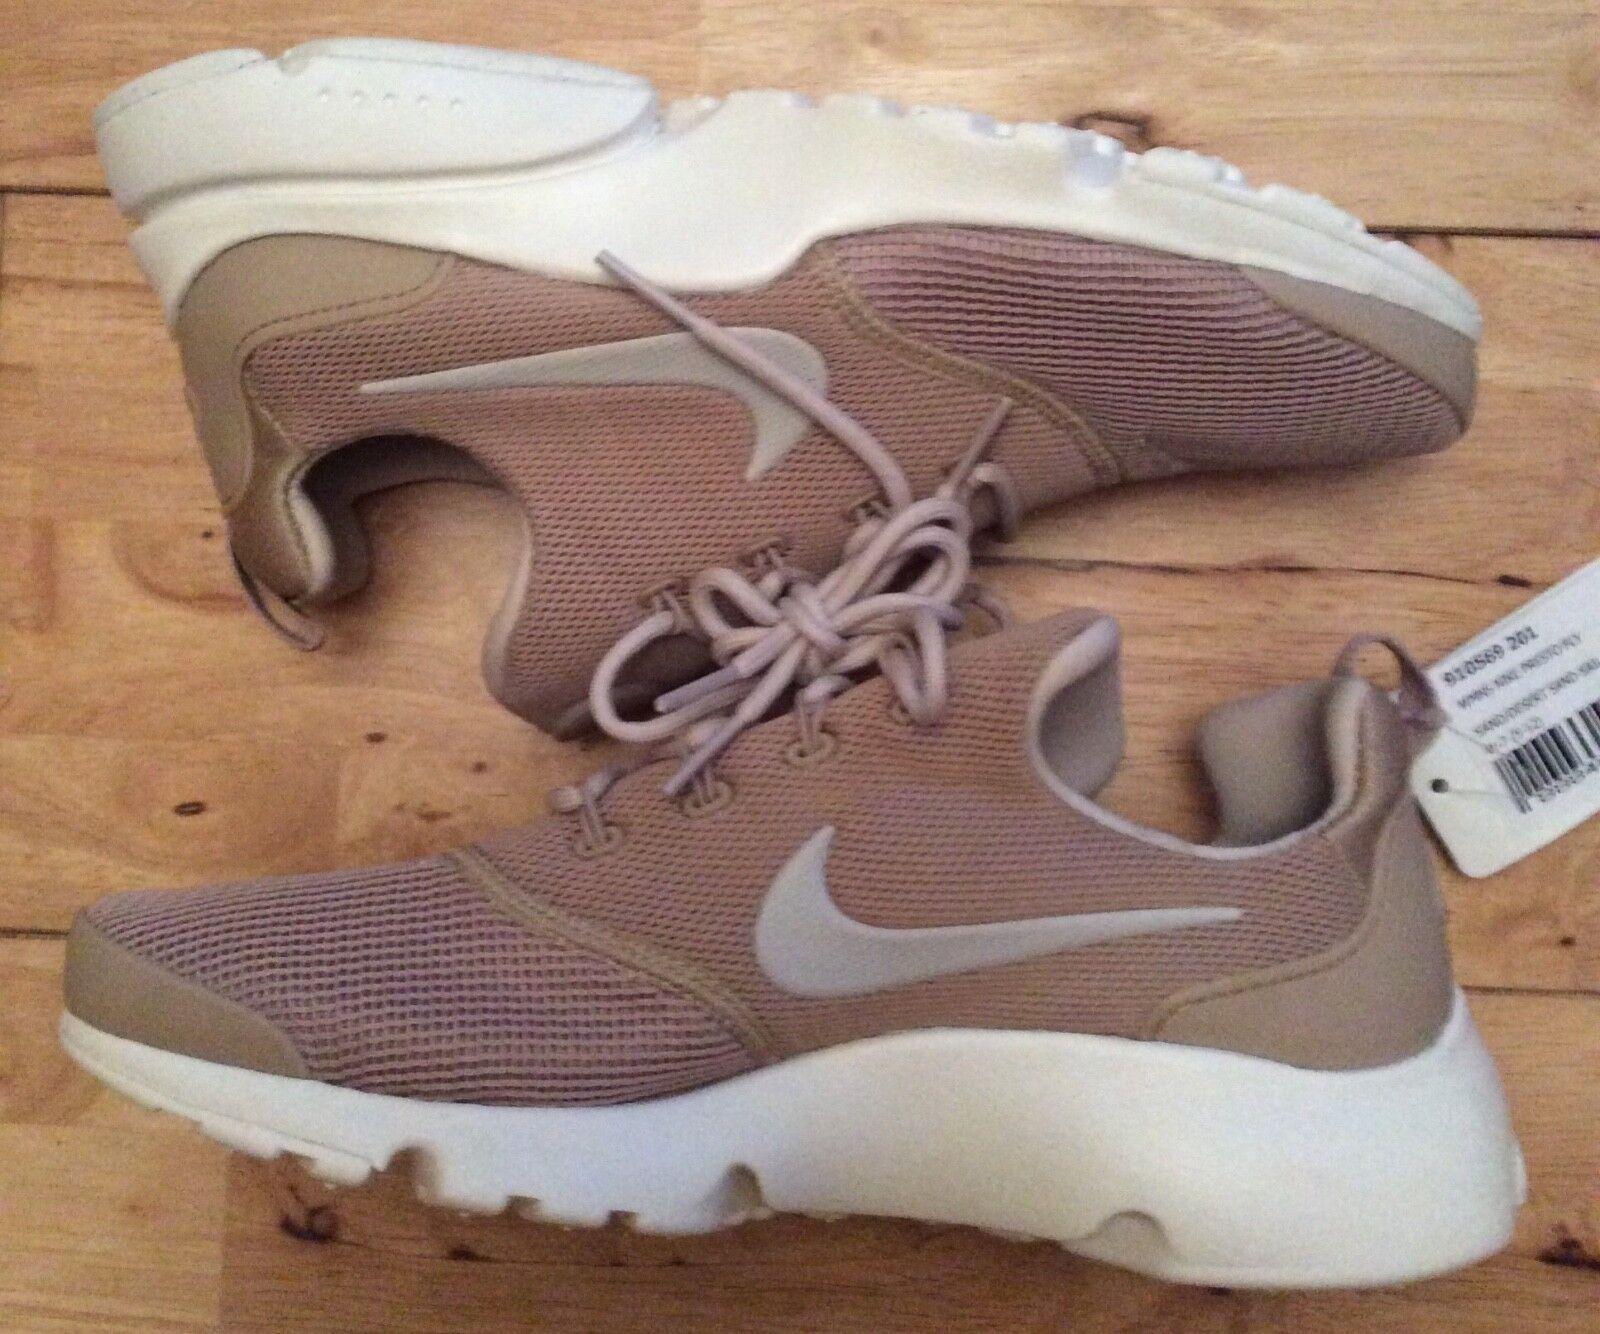 damen's Nike Presto Fly Sand  UK4.5 EU38 US7  Sample schuhe 910569-201